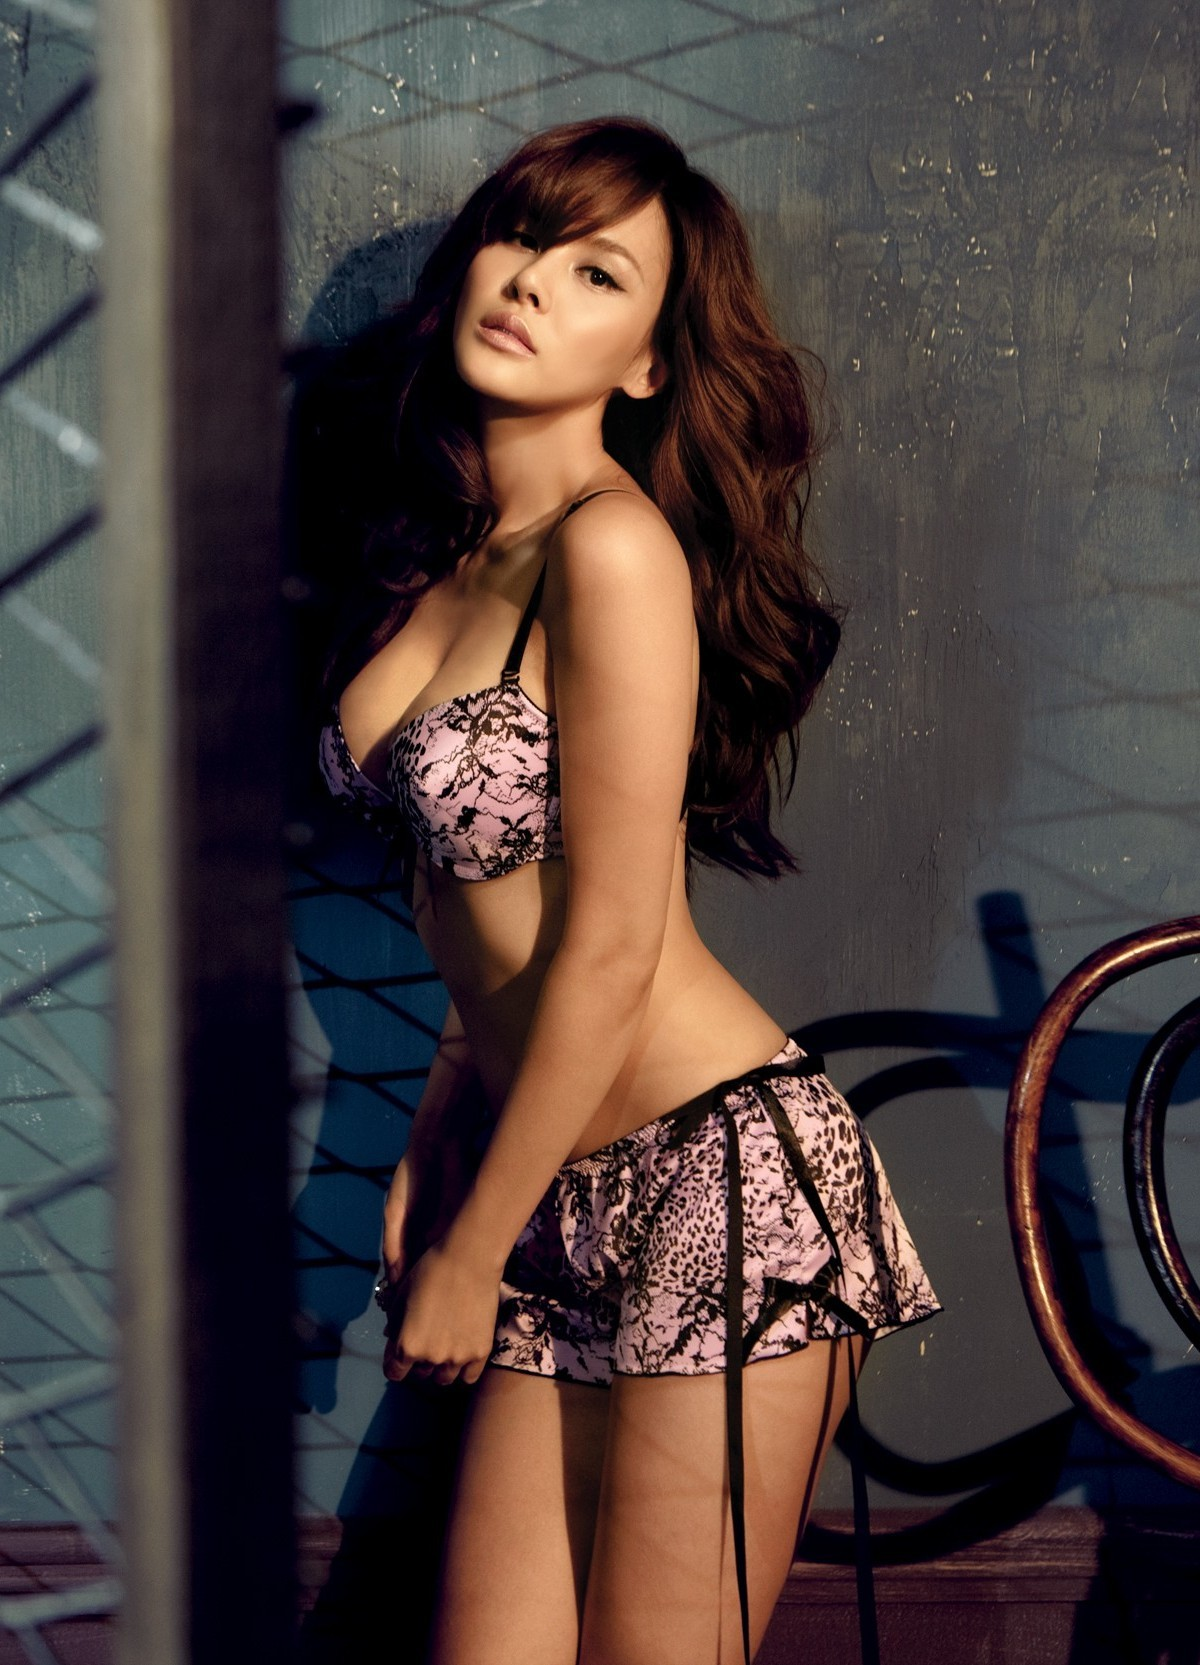 Teen model sex nude, Jessica simpson big tits